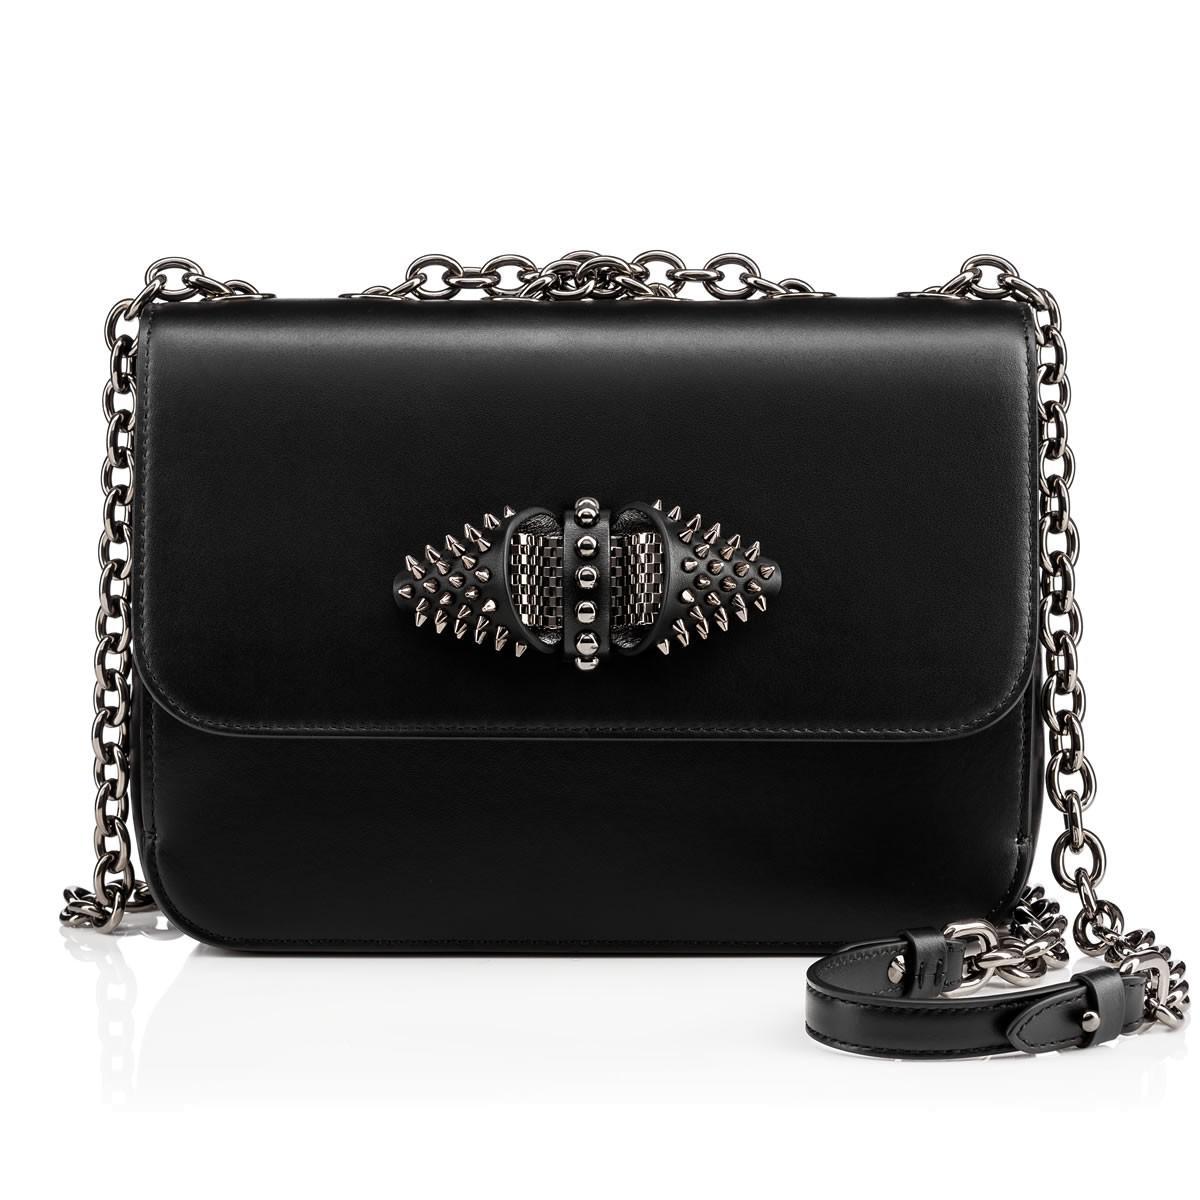 6144f626a54 Gallery. Women's Chain Strap Bags Women's Christian Louboutin Sweet Charity